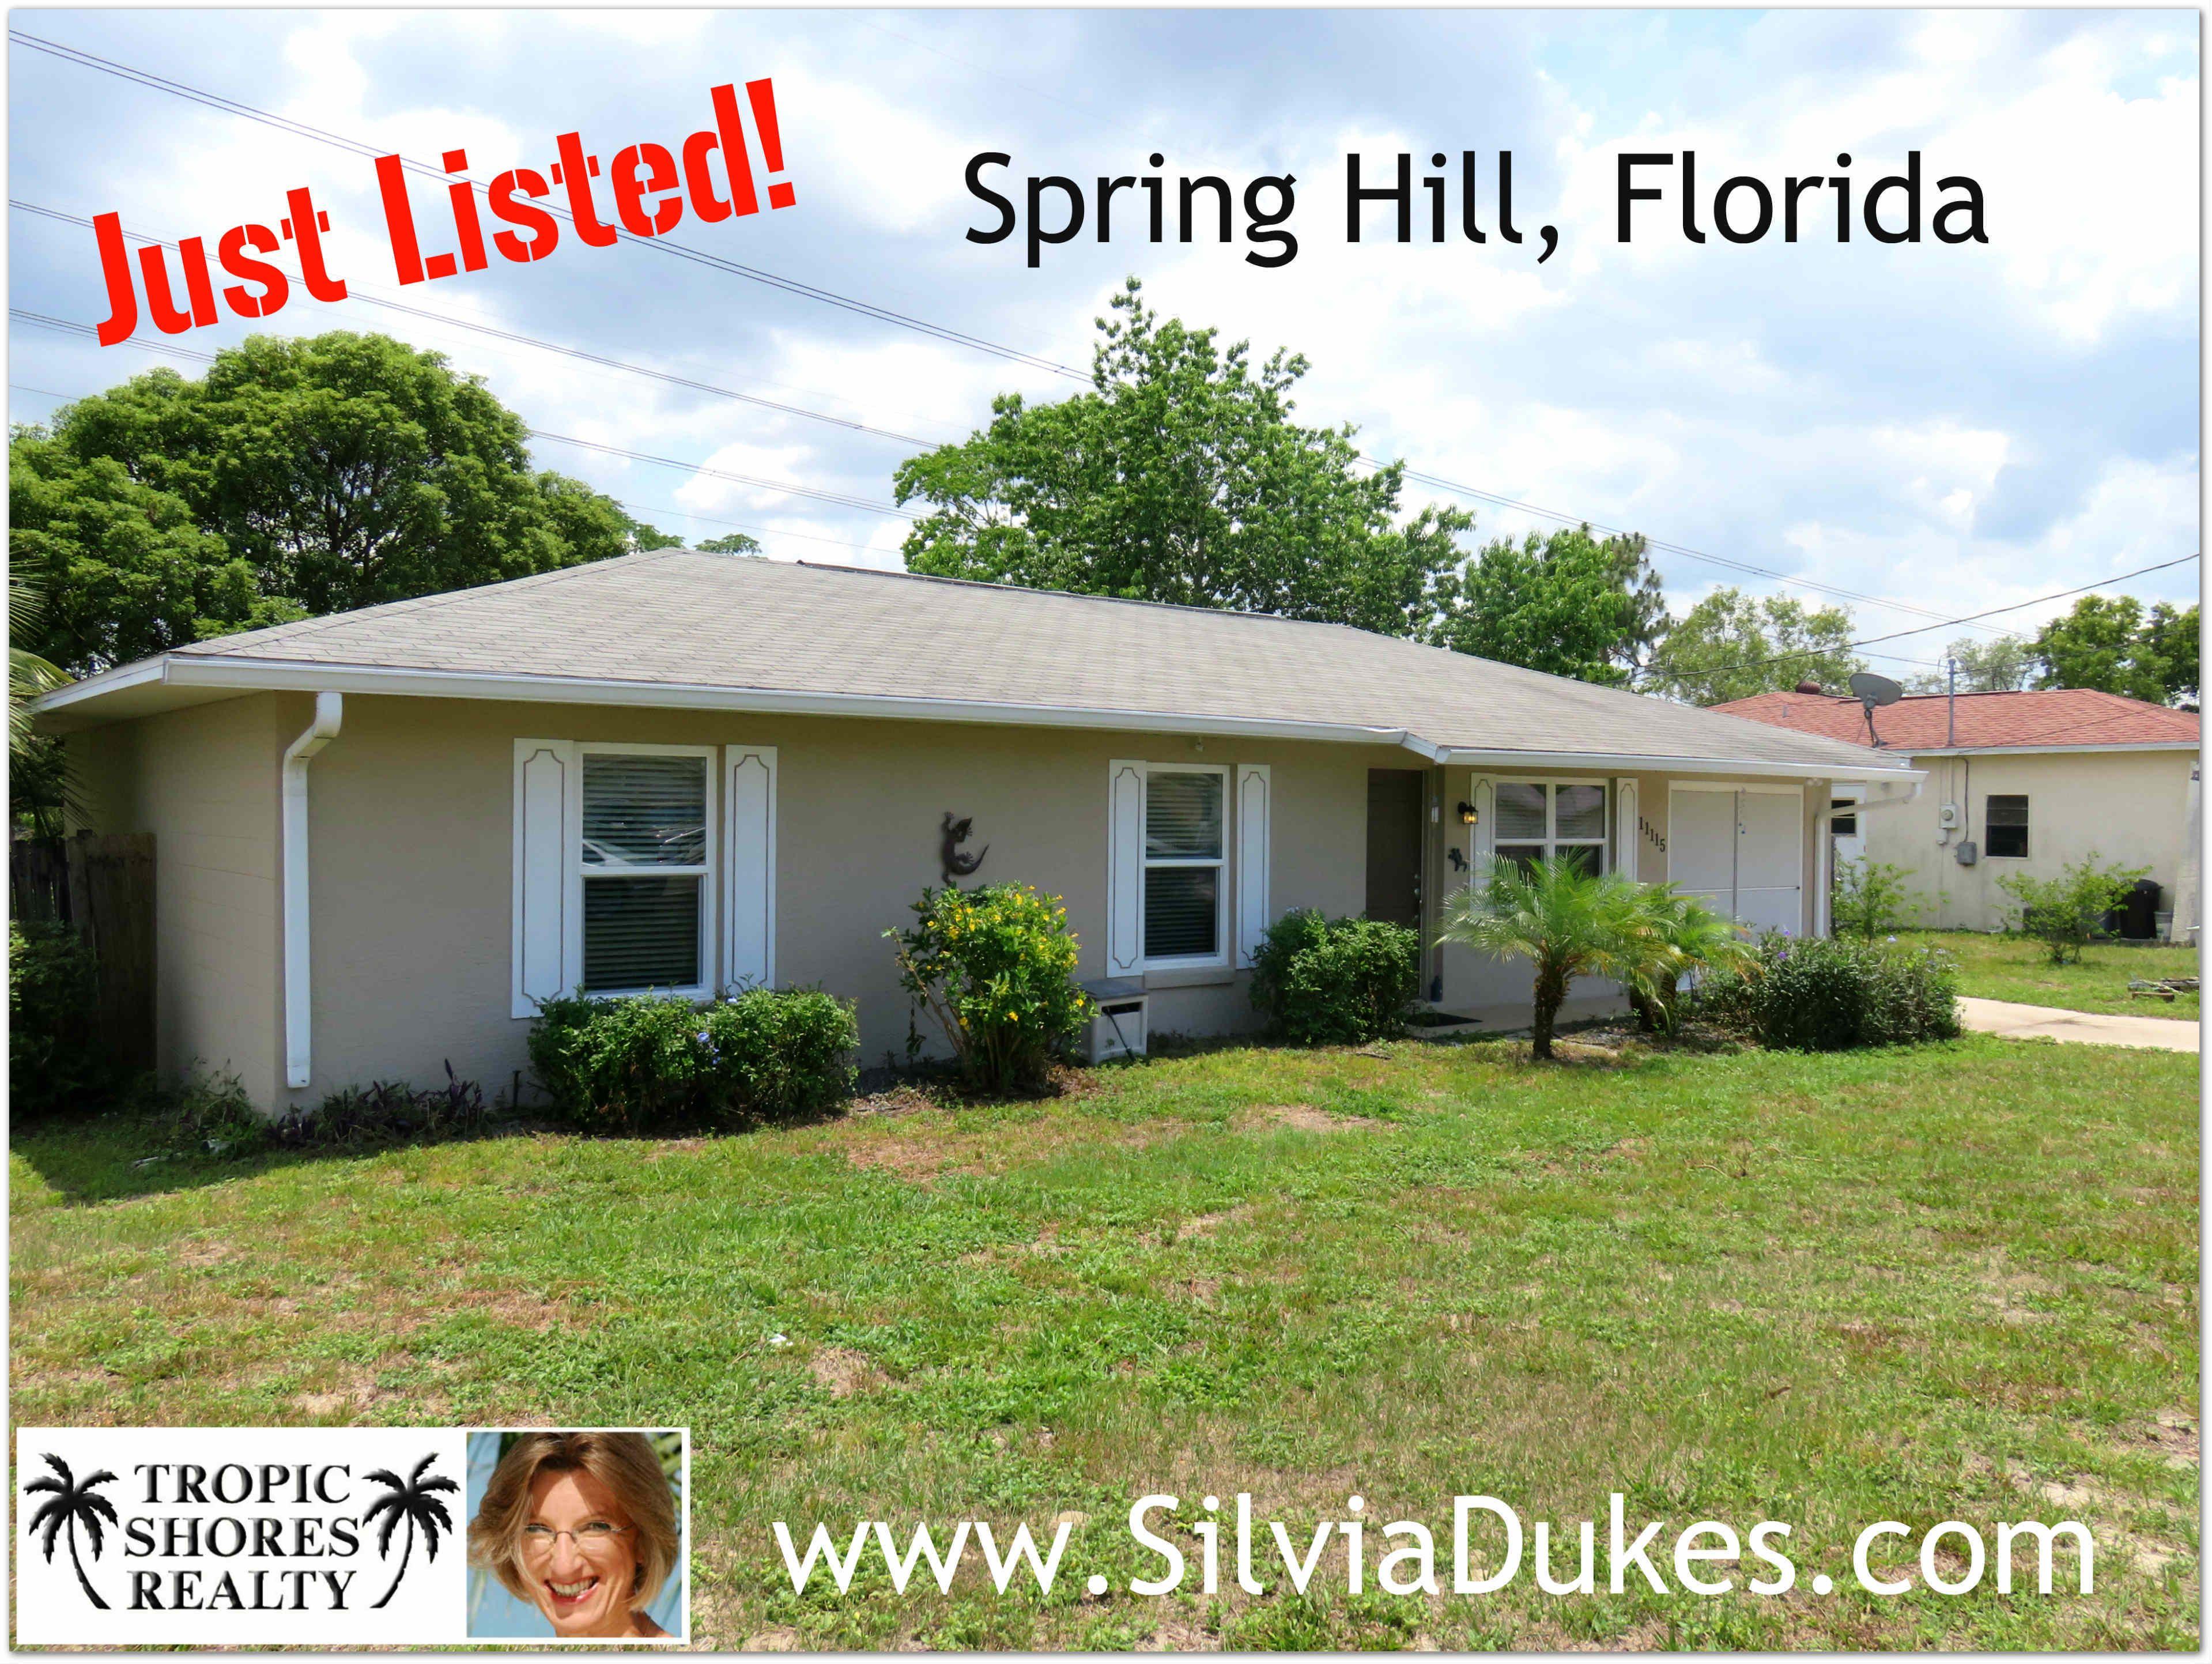 674376035554106cd443b88625513660 - The Gardens At Seven Hills Spring Hill Fl